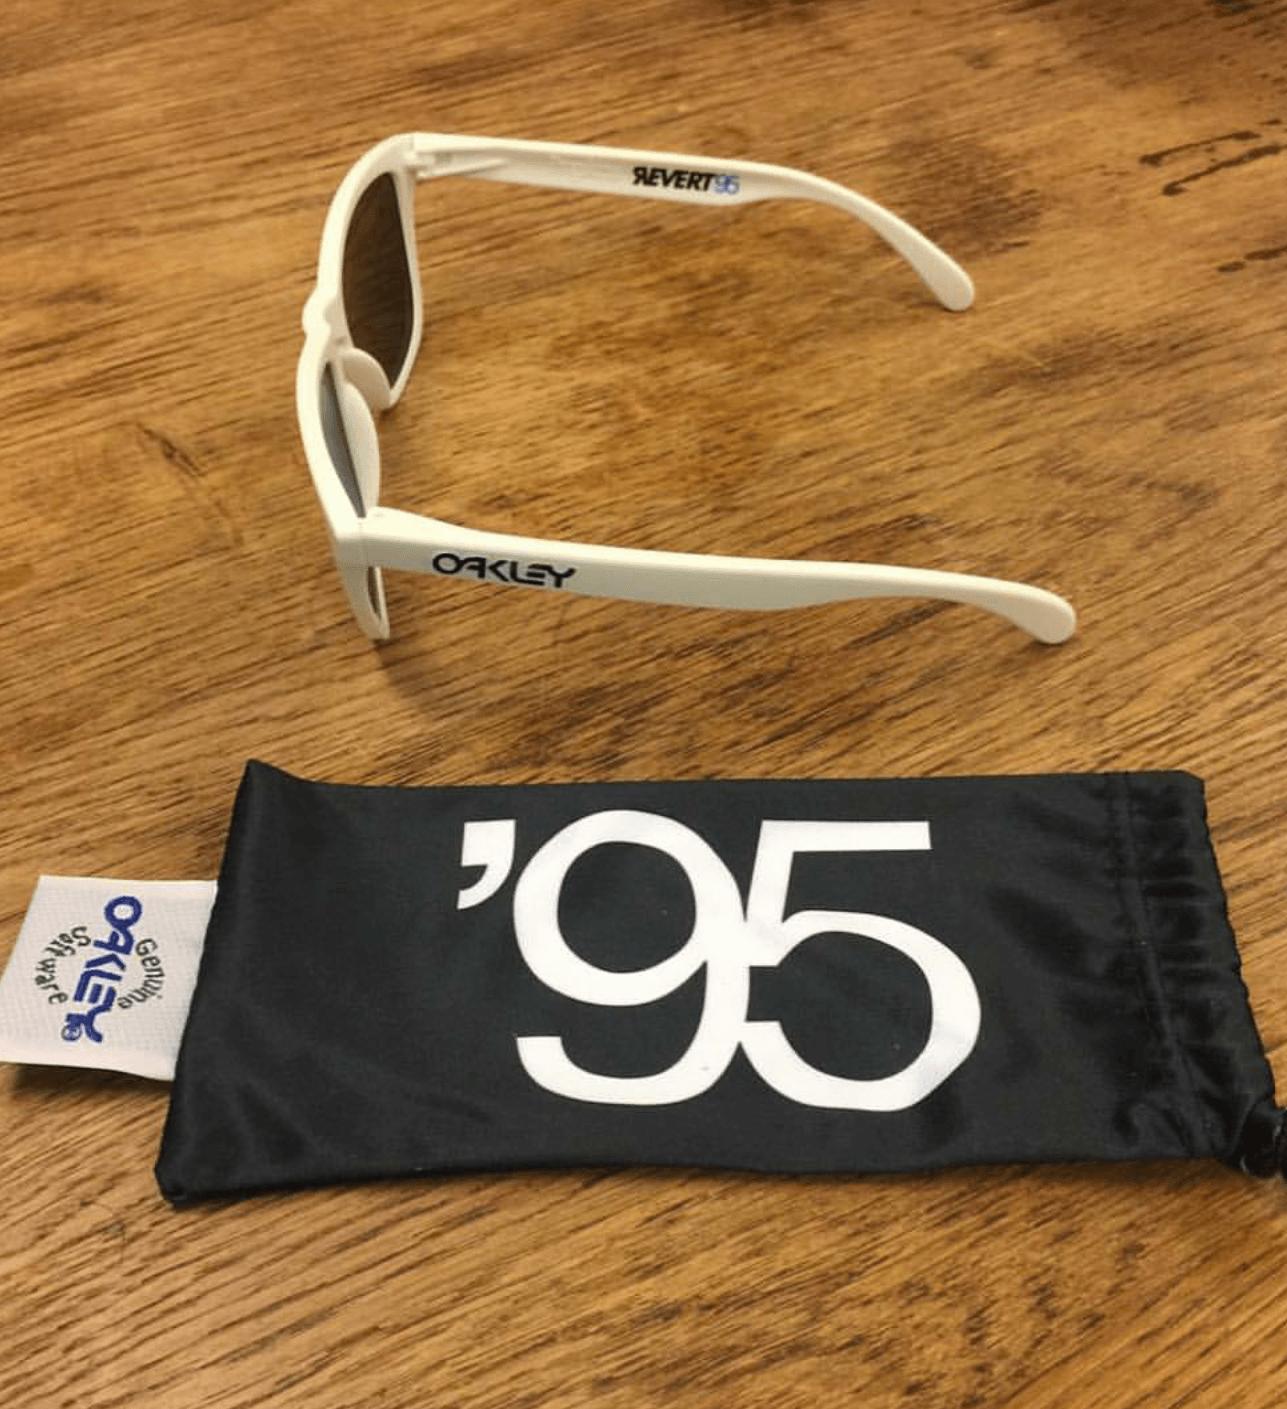 New Release: Revert95 x Oakley Frogskins - Revert95 x Oakley Frogskins Sunglasses.png